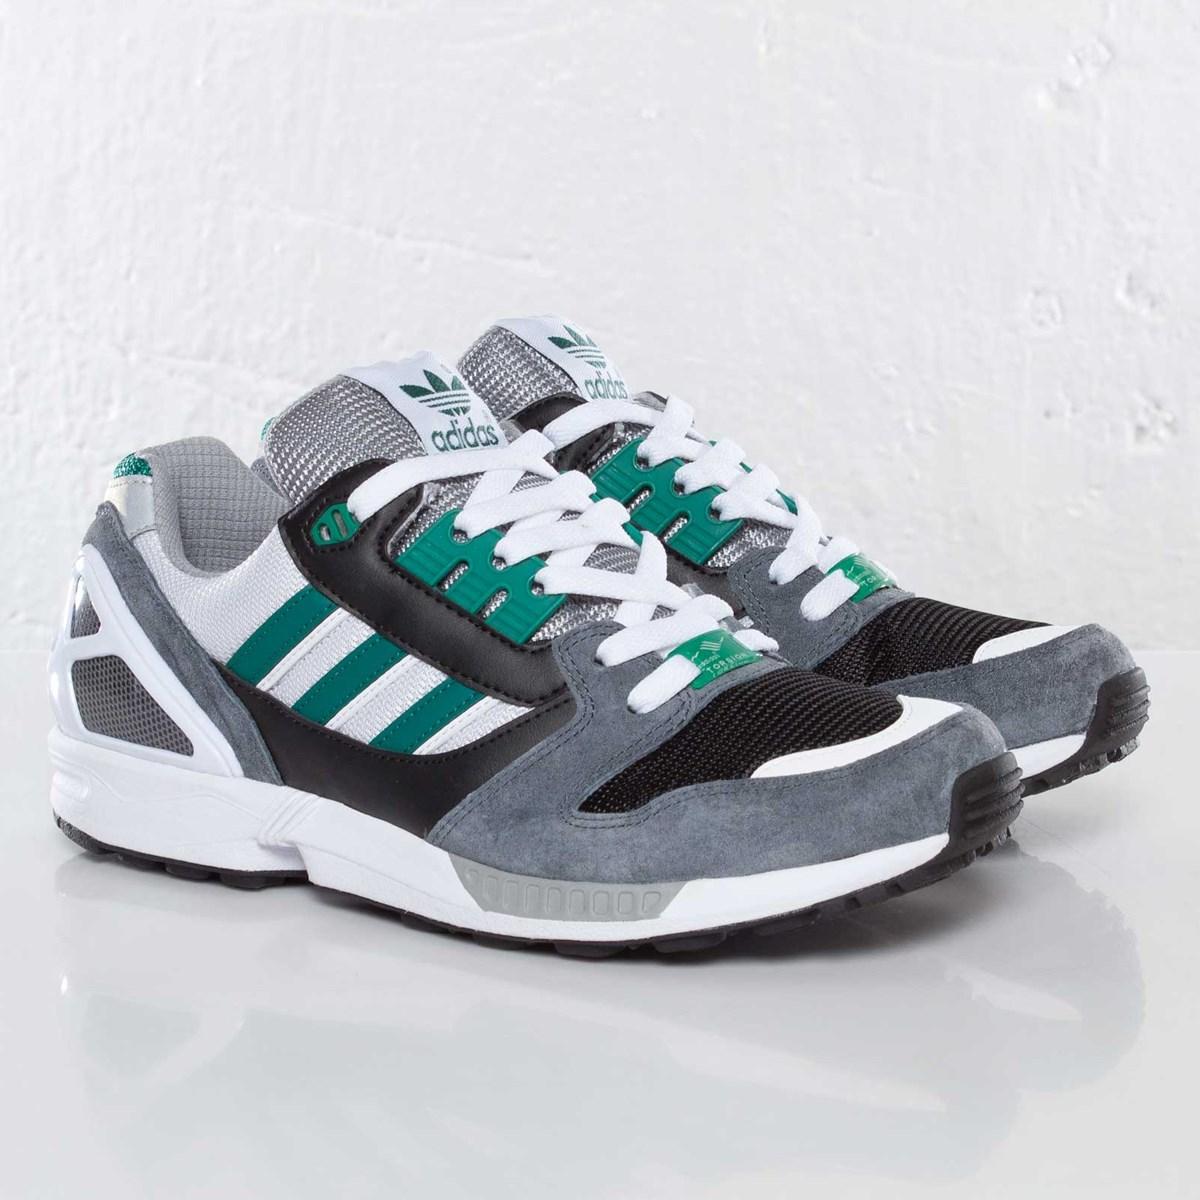 d2e33ffca82f adidas Zx 8000 Mita - G97747 - Sneakersnstuff